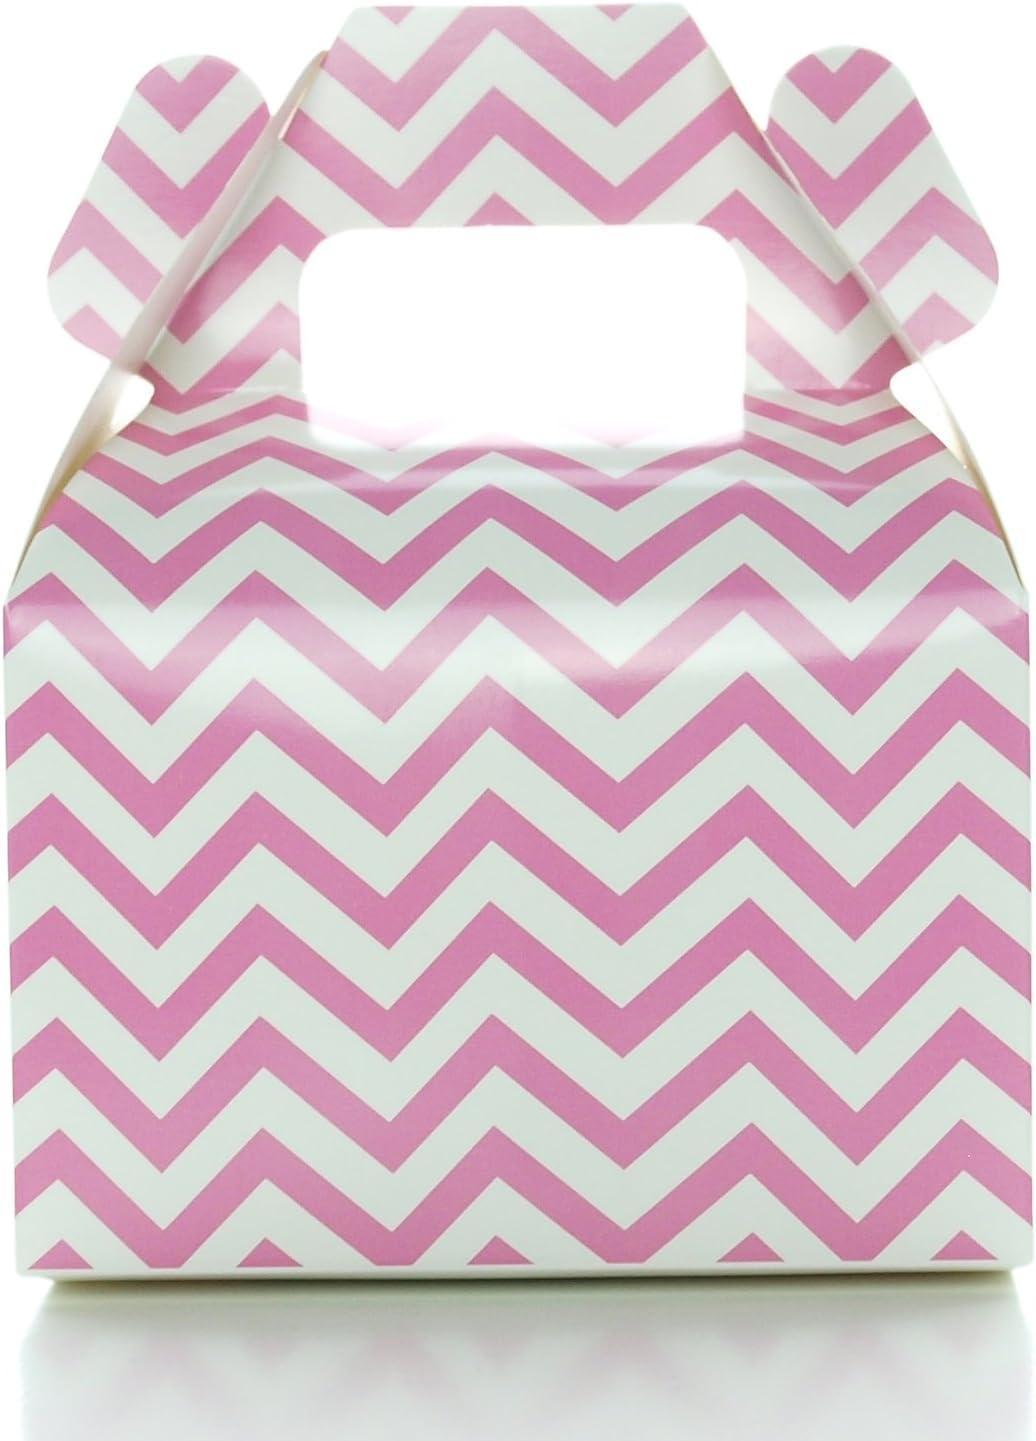 Amazon.com: Caliente rosa cajas de caramelos, pequeño ...